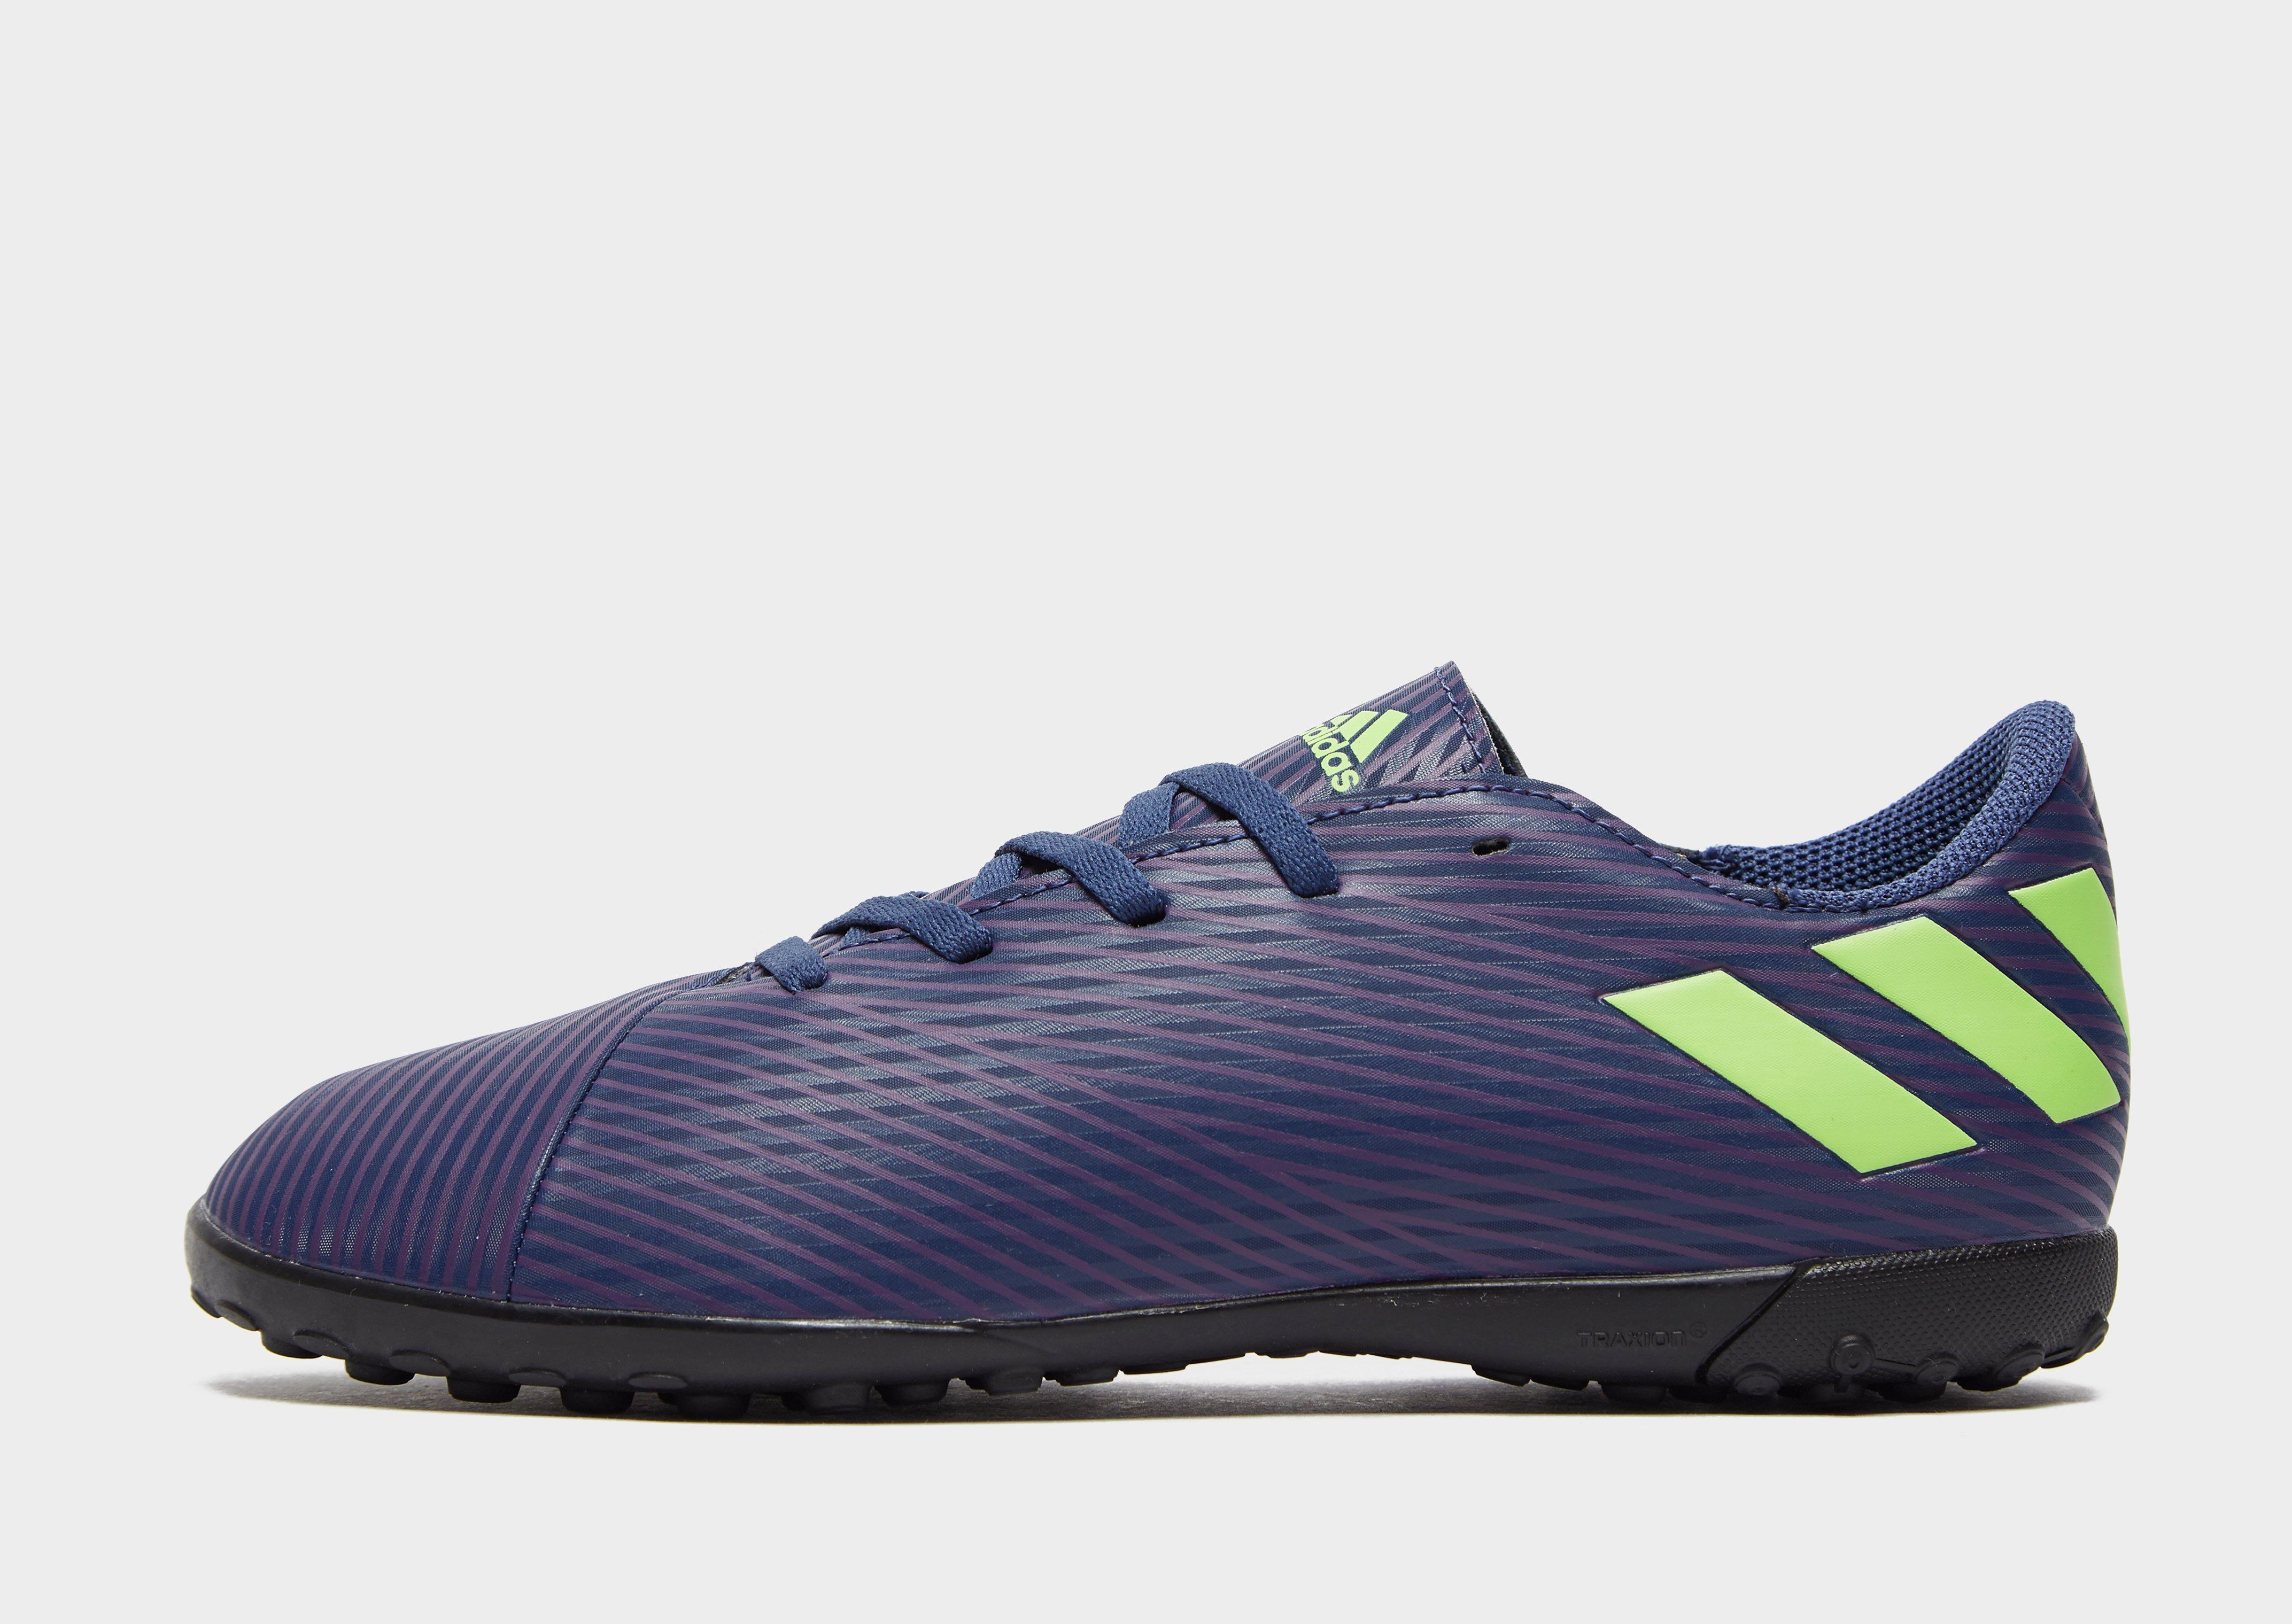 adidas Nemeziz Messi 19.4 TF Junior | JD Sports